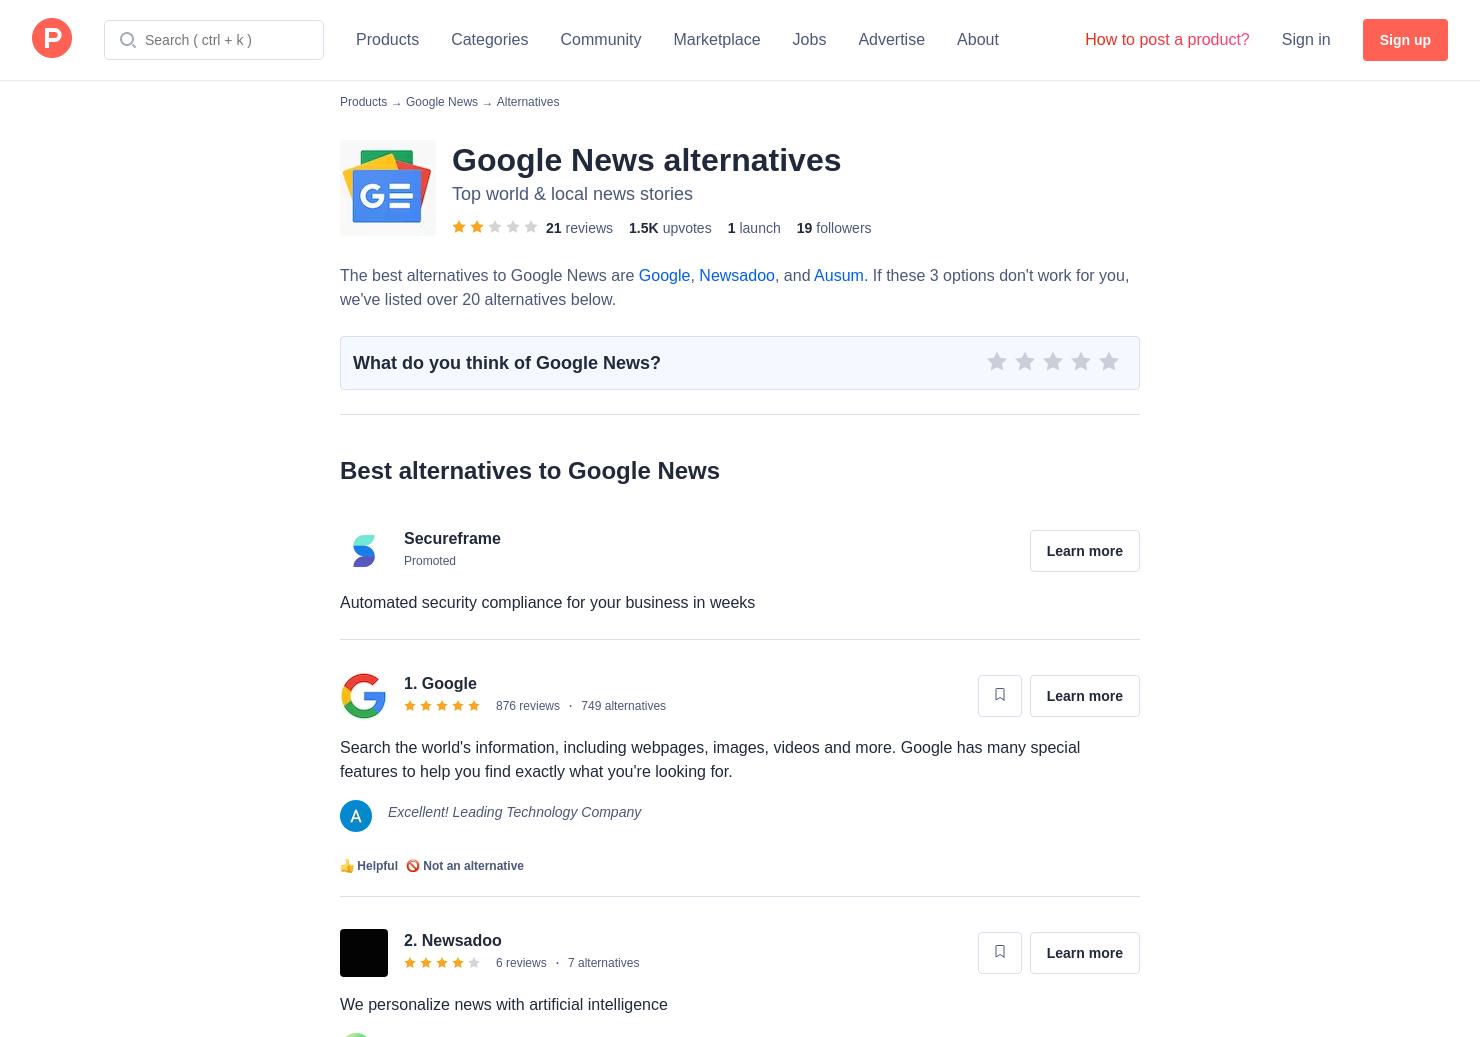 26 Alternatives to Google News | Product Hunt